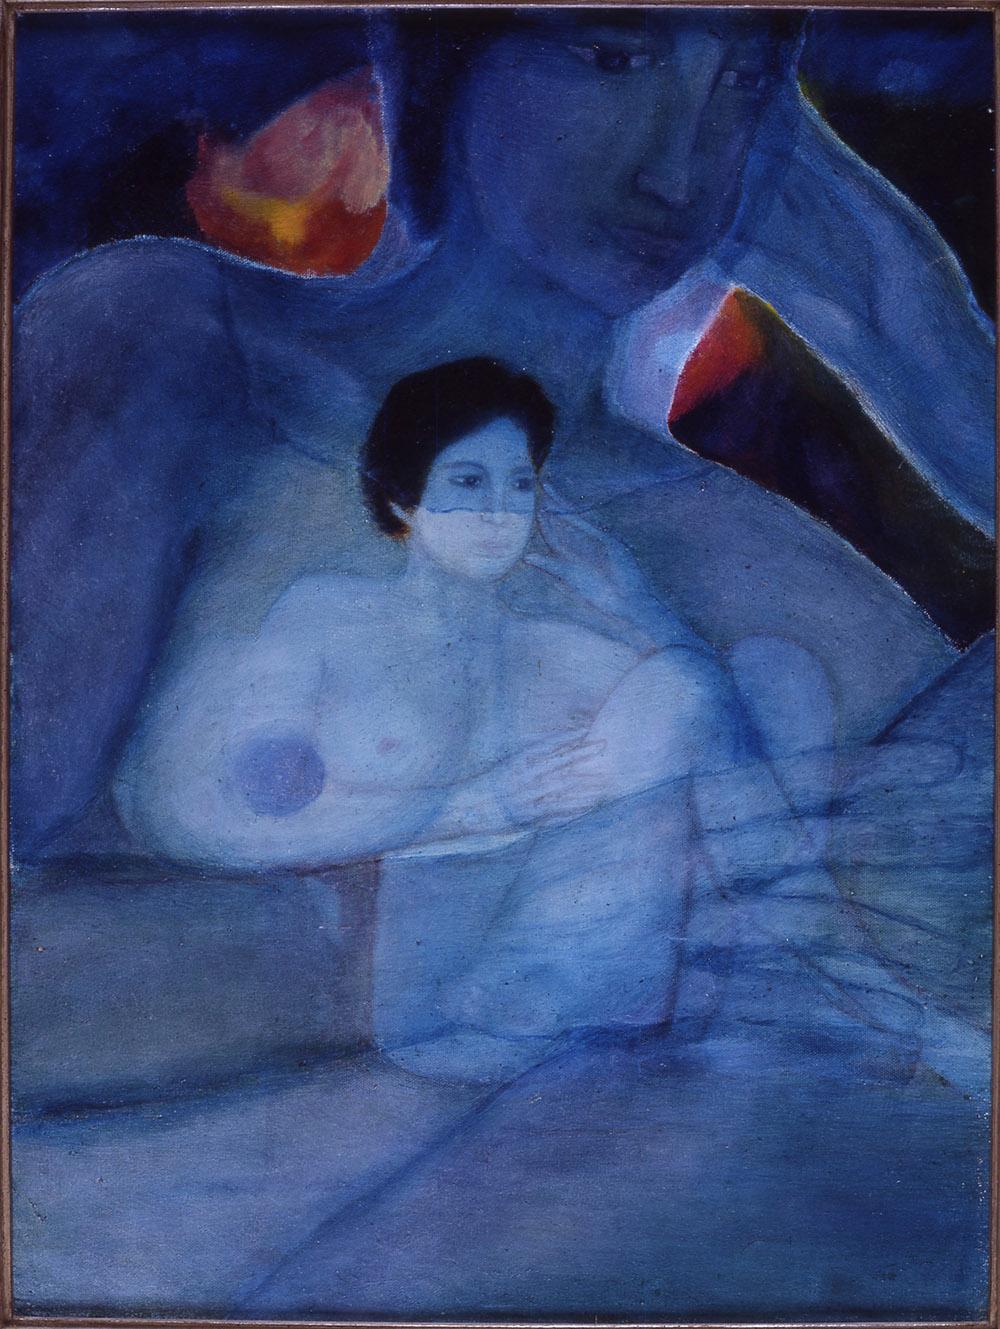 27.-Ono-Woman-1985.-Oil-on-canvas-76.2-x-61-cm-x.jpg